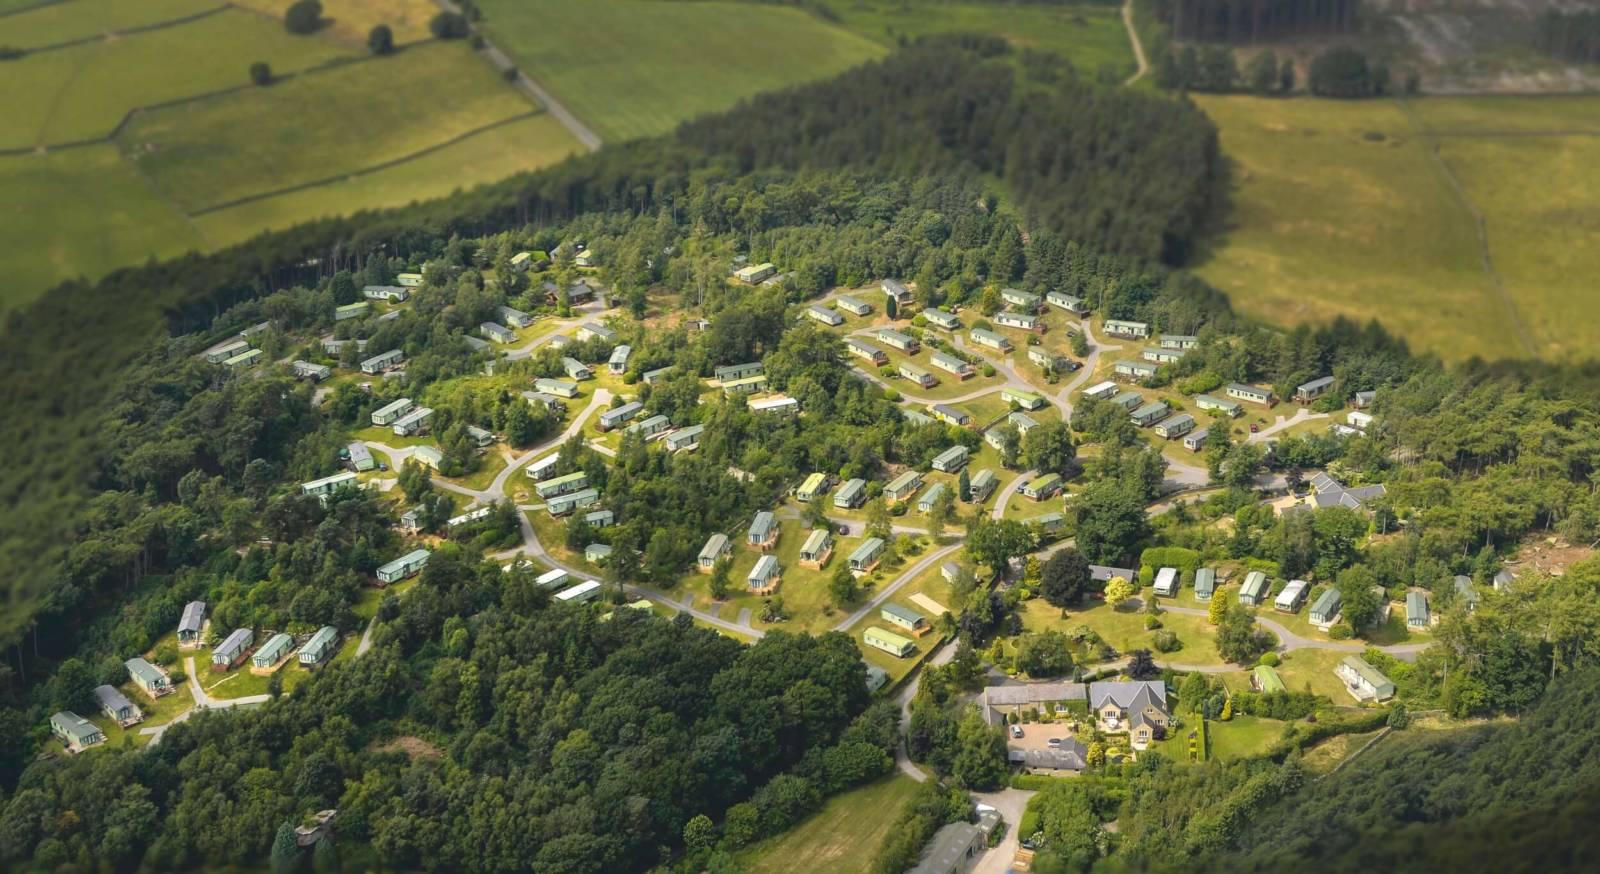 Warren Forest Luxury holiday caravans Aerial Photo